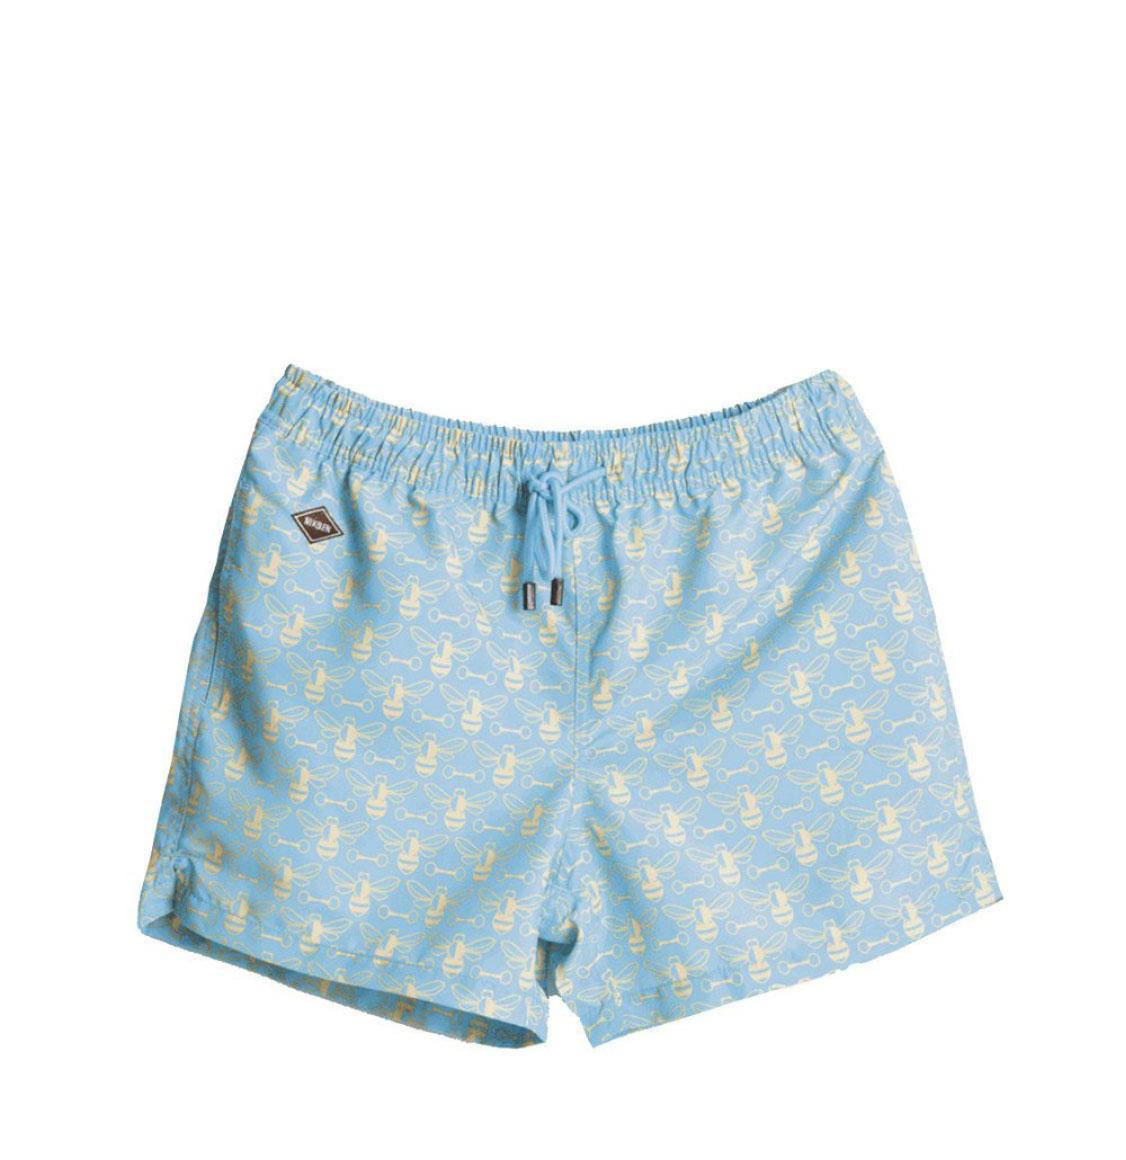 Nikben Beehave Swim Shorts Light Blue